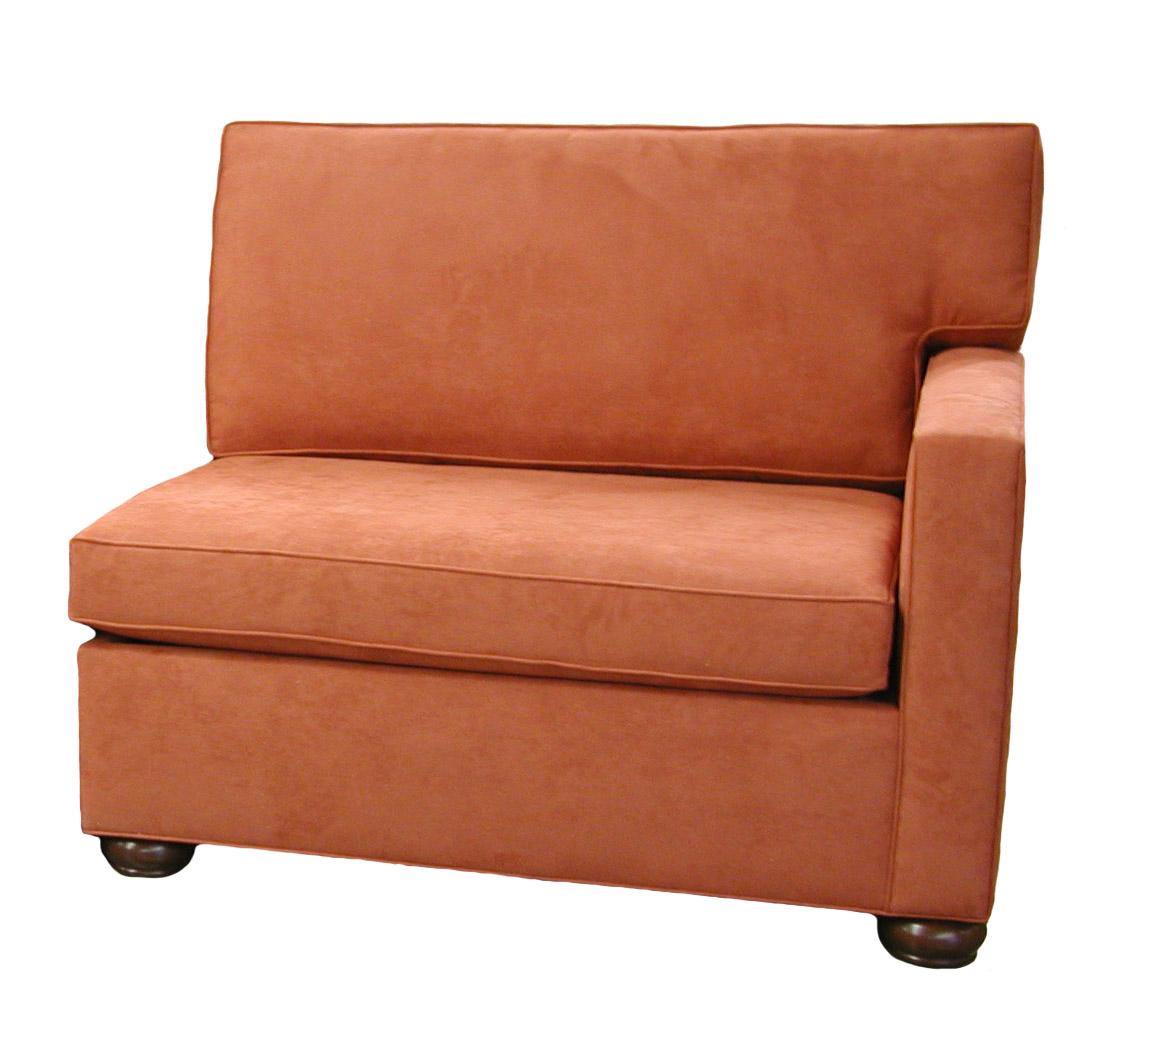 Crawford Sectional Single Sleeper Sofa Right Facing Carolina Chair North Carolina American Usa